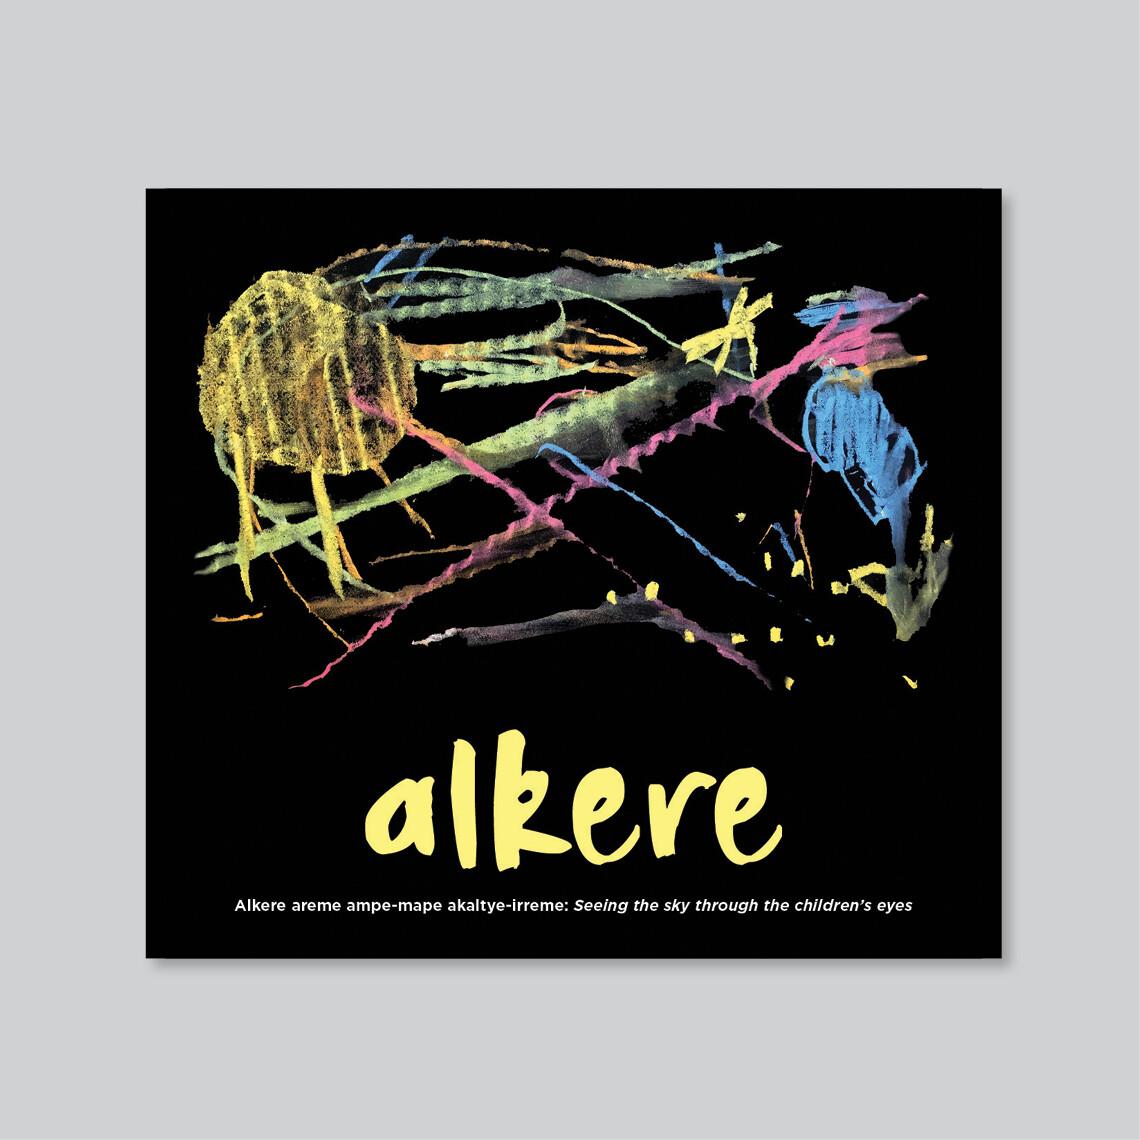 Alkere (Sky) Book